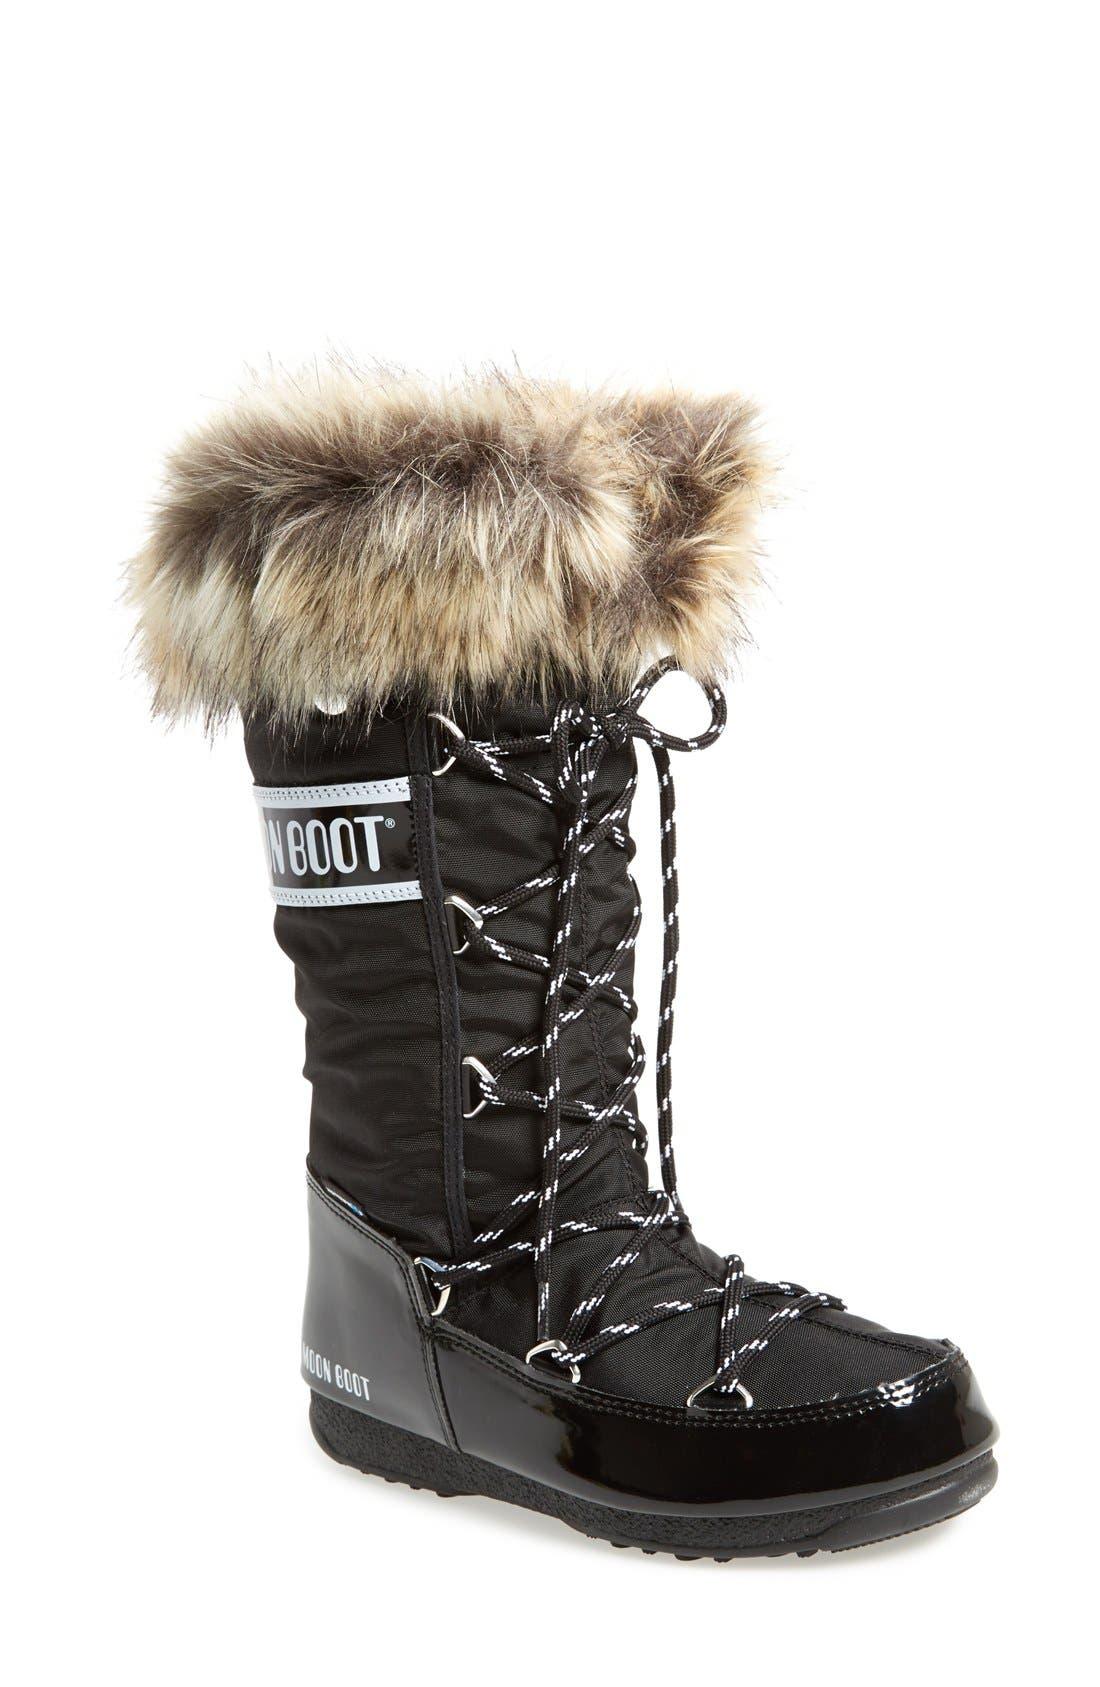 'Monaco' Waterproof Insulated Moon Boot<sup>®</sup>,                             Main thumbnail 1, color,                             001